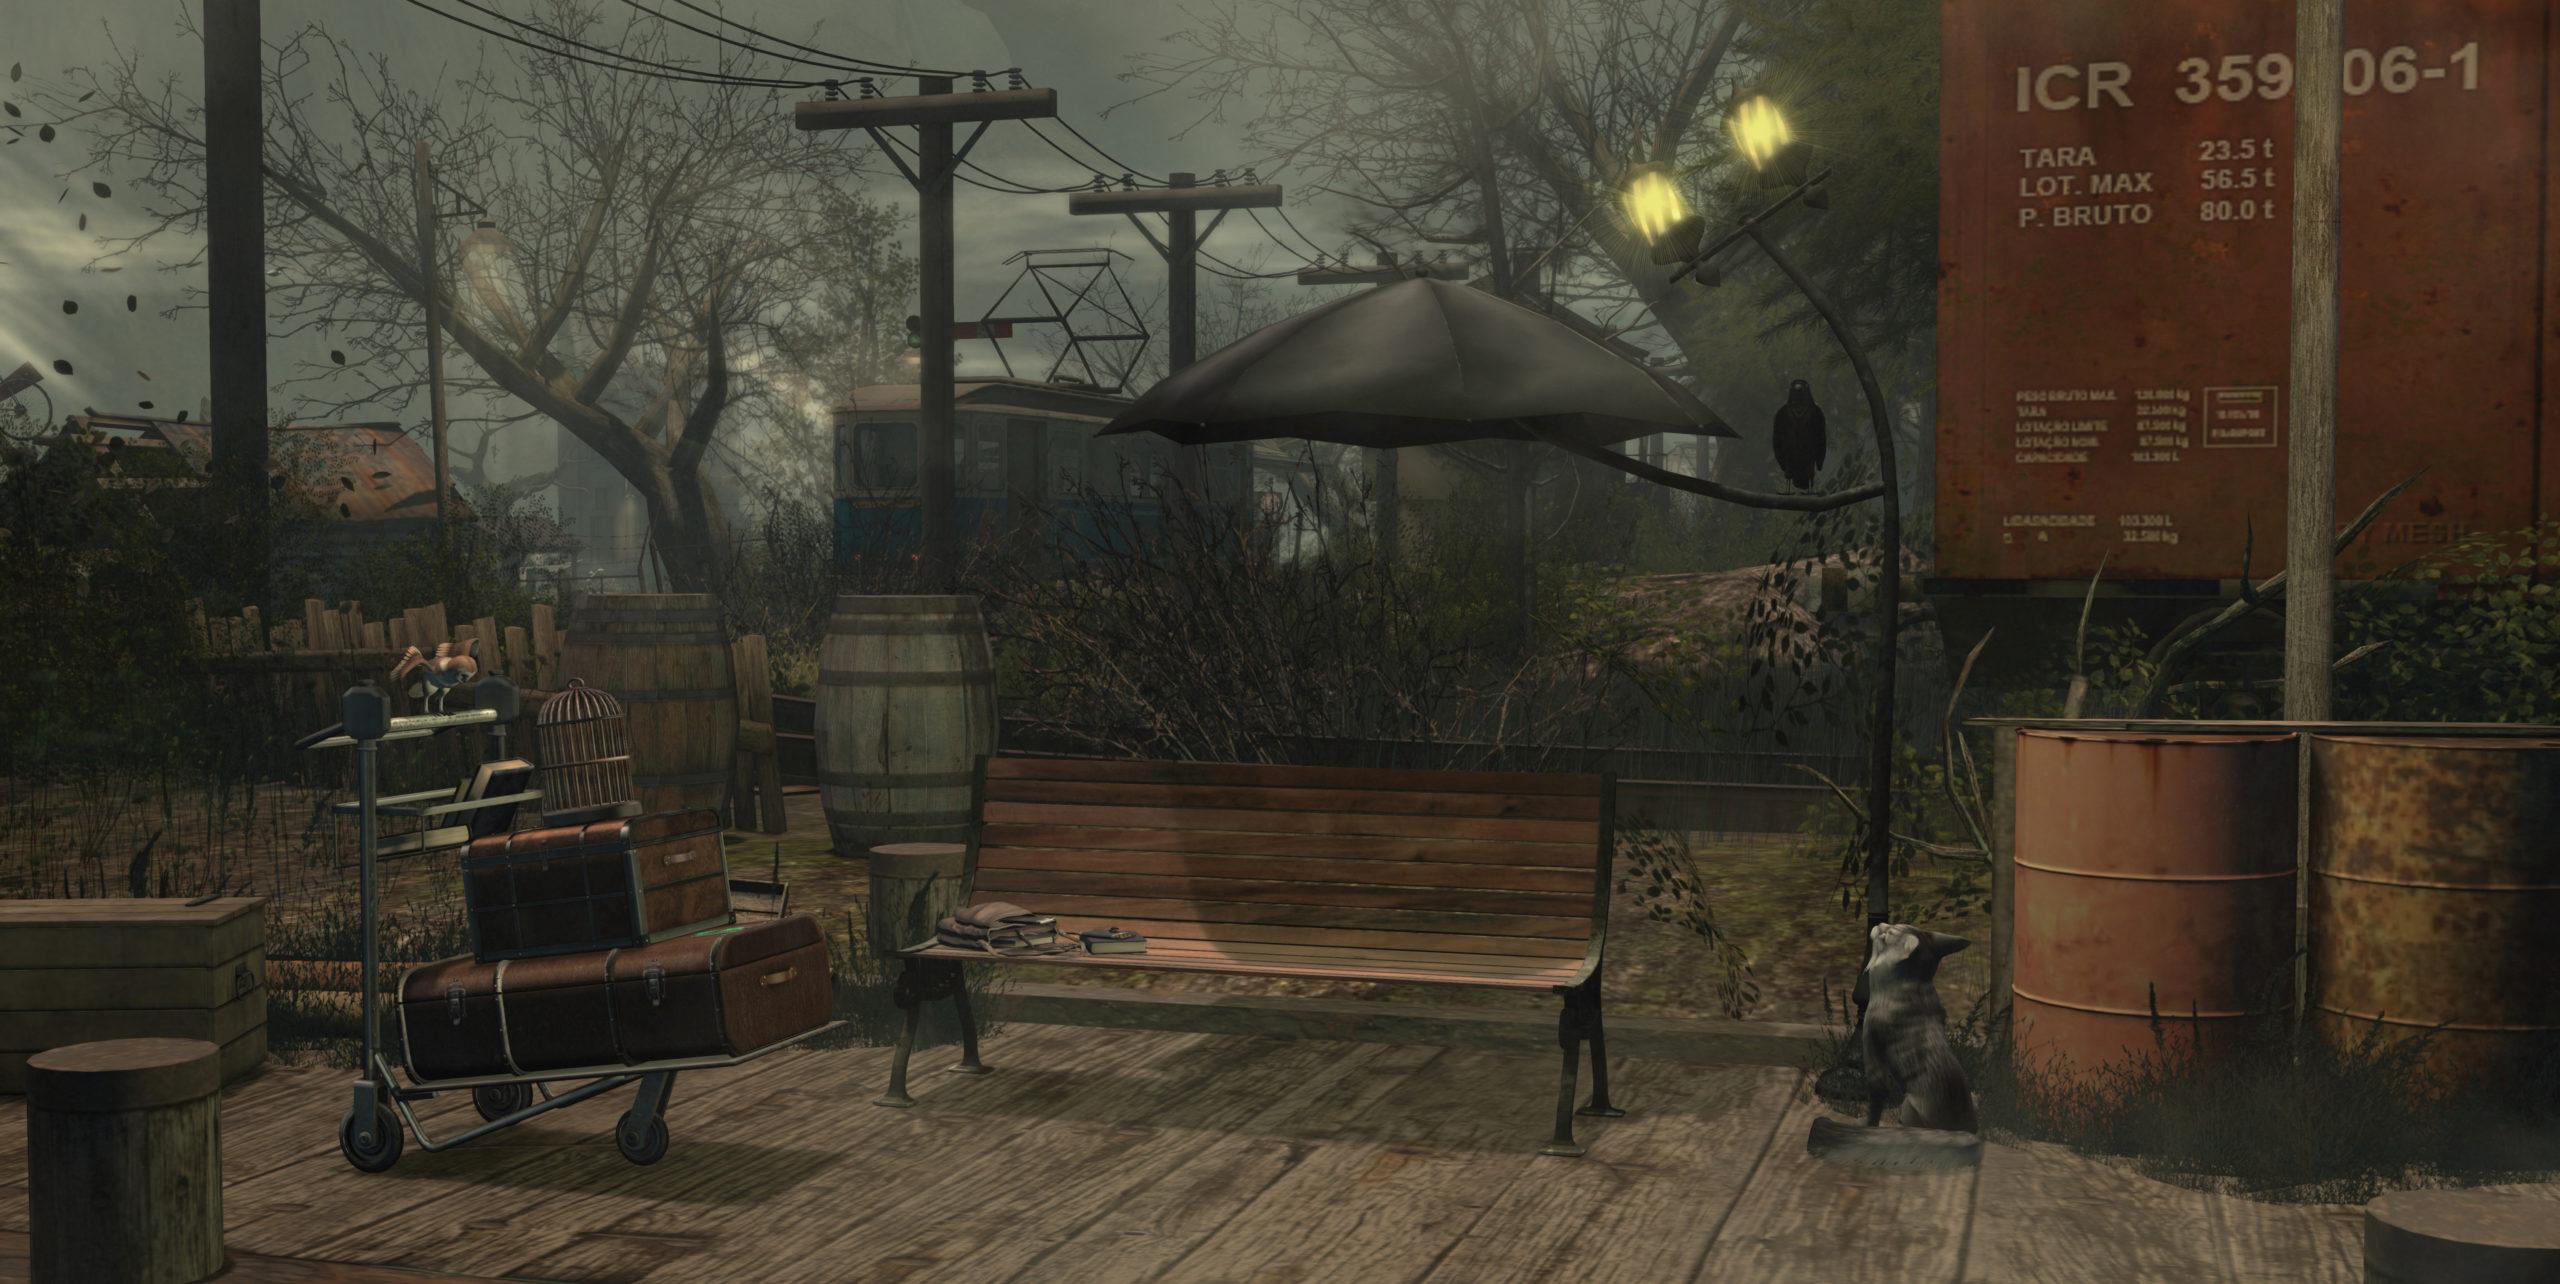 Goose - Umbrella bench